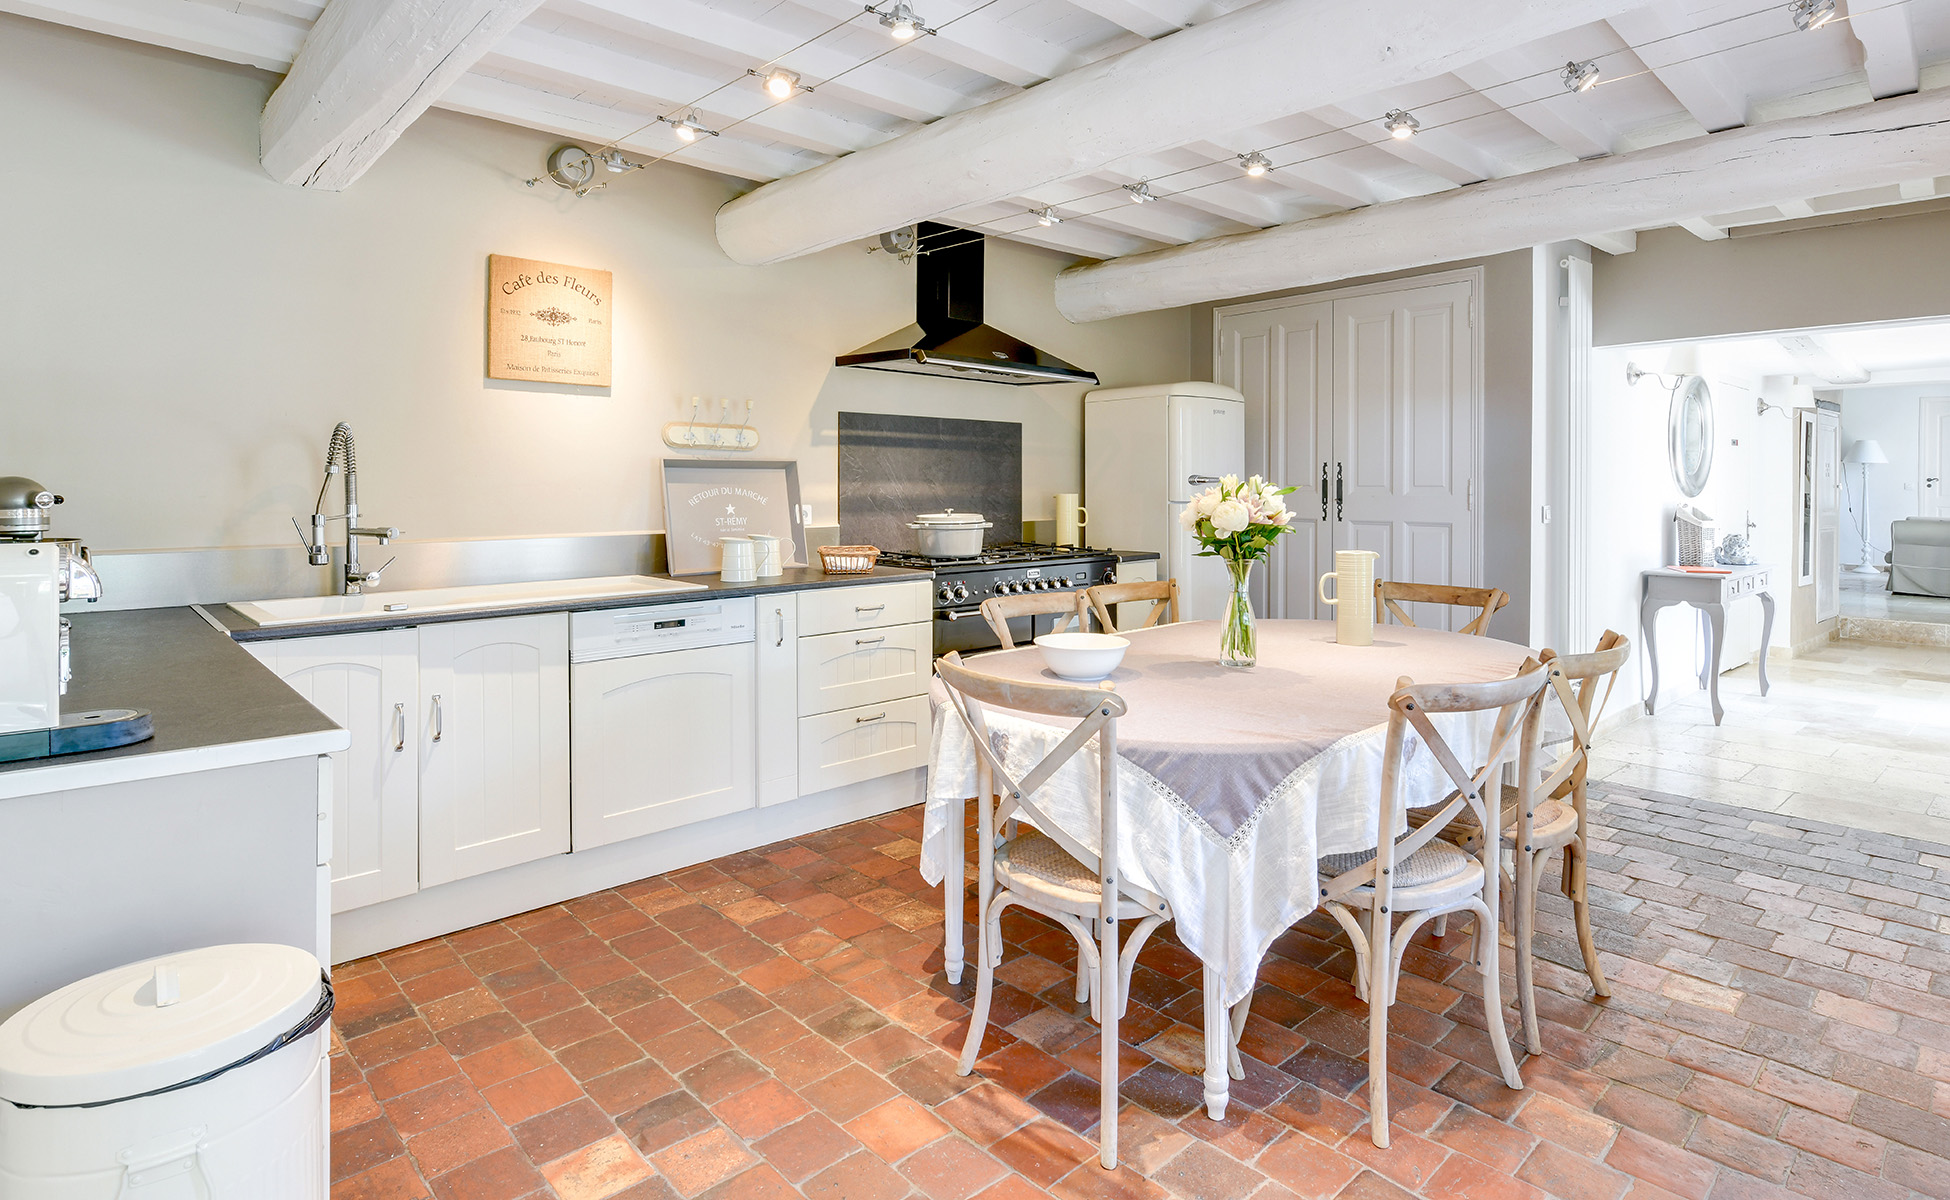 Lovelydays luxury service apartment rental - St Rémy de Provence and surroundings - Ameu Mas - Partner - 6 bedrooms - 6 bathrooms - Dining living room - 34fb859d6f1e - Lovelydays